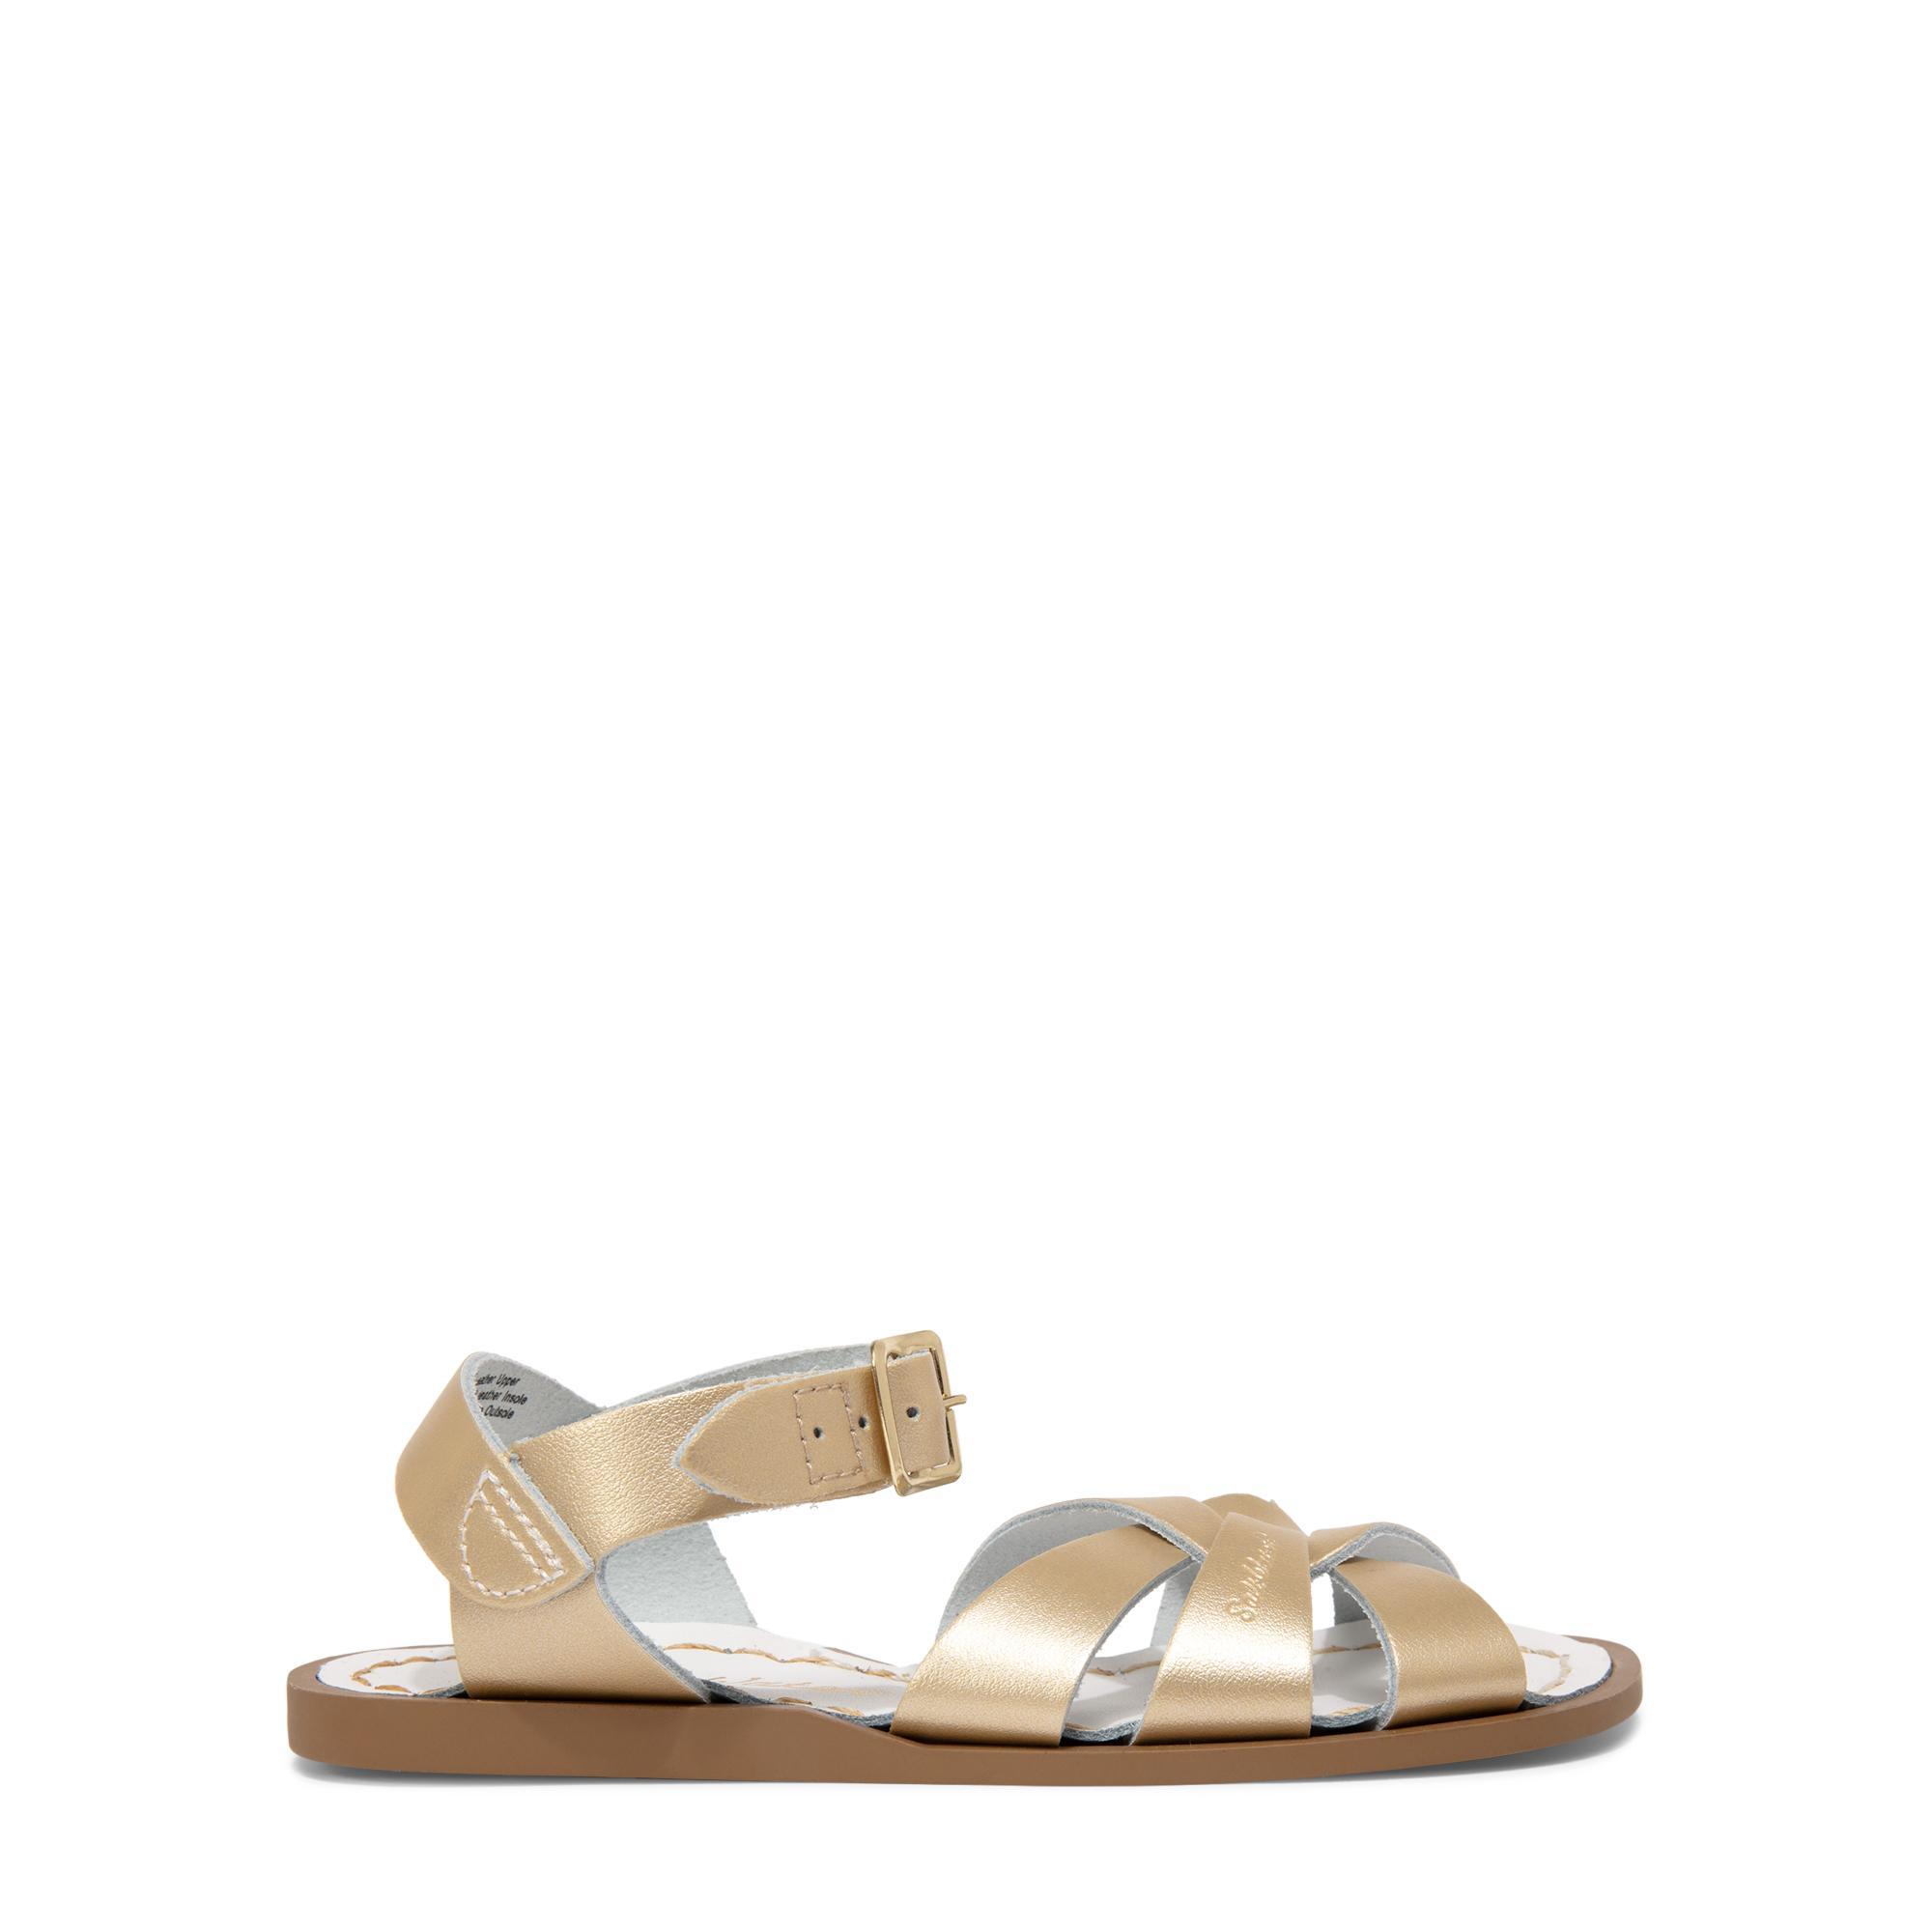 Swimmer sandals